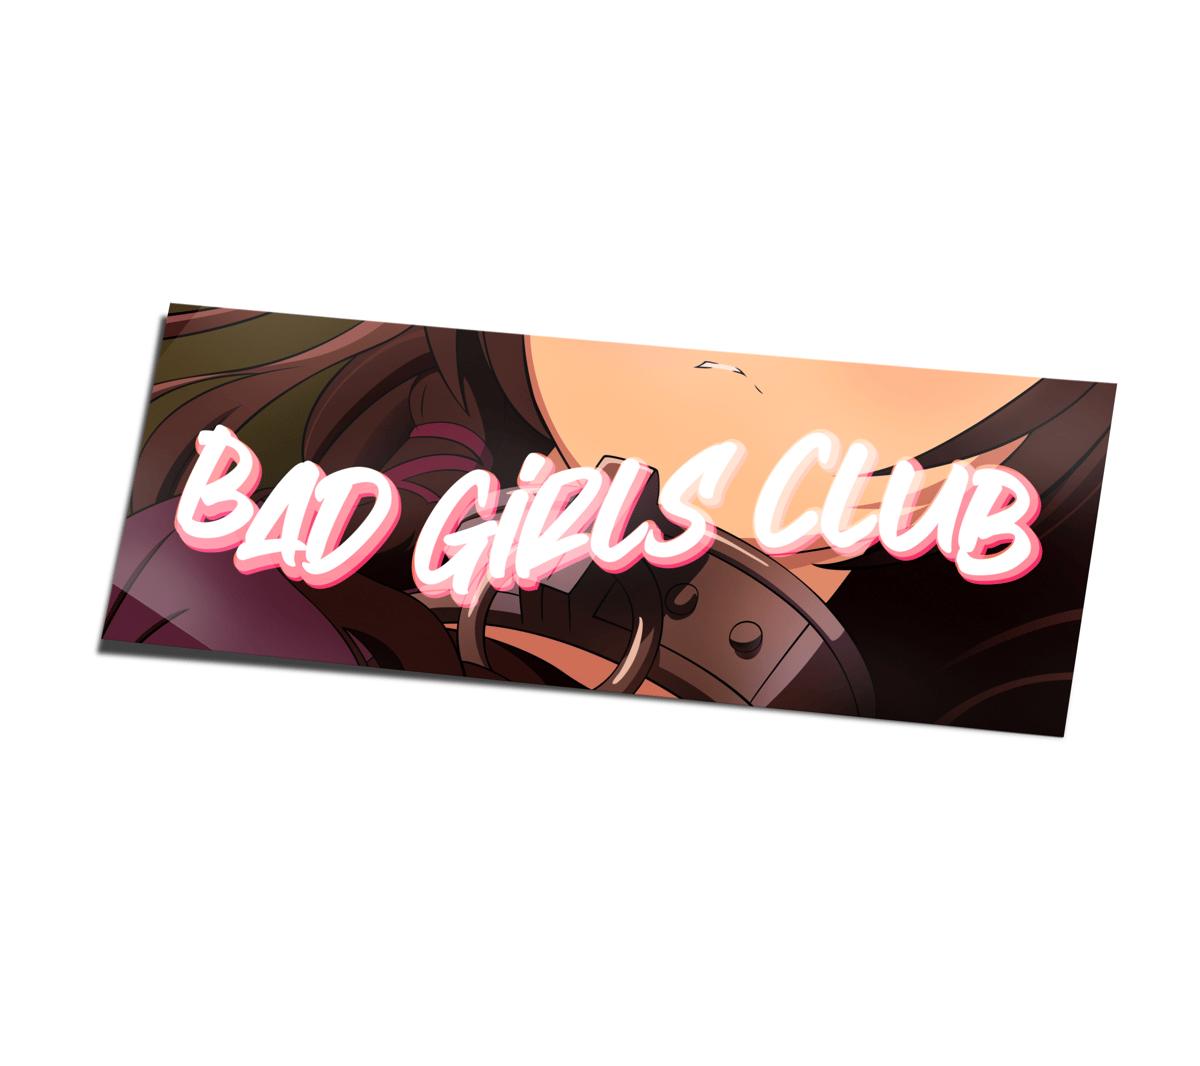 Image of Bad Girls/Bitch Club Rem